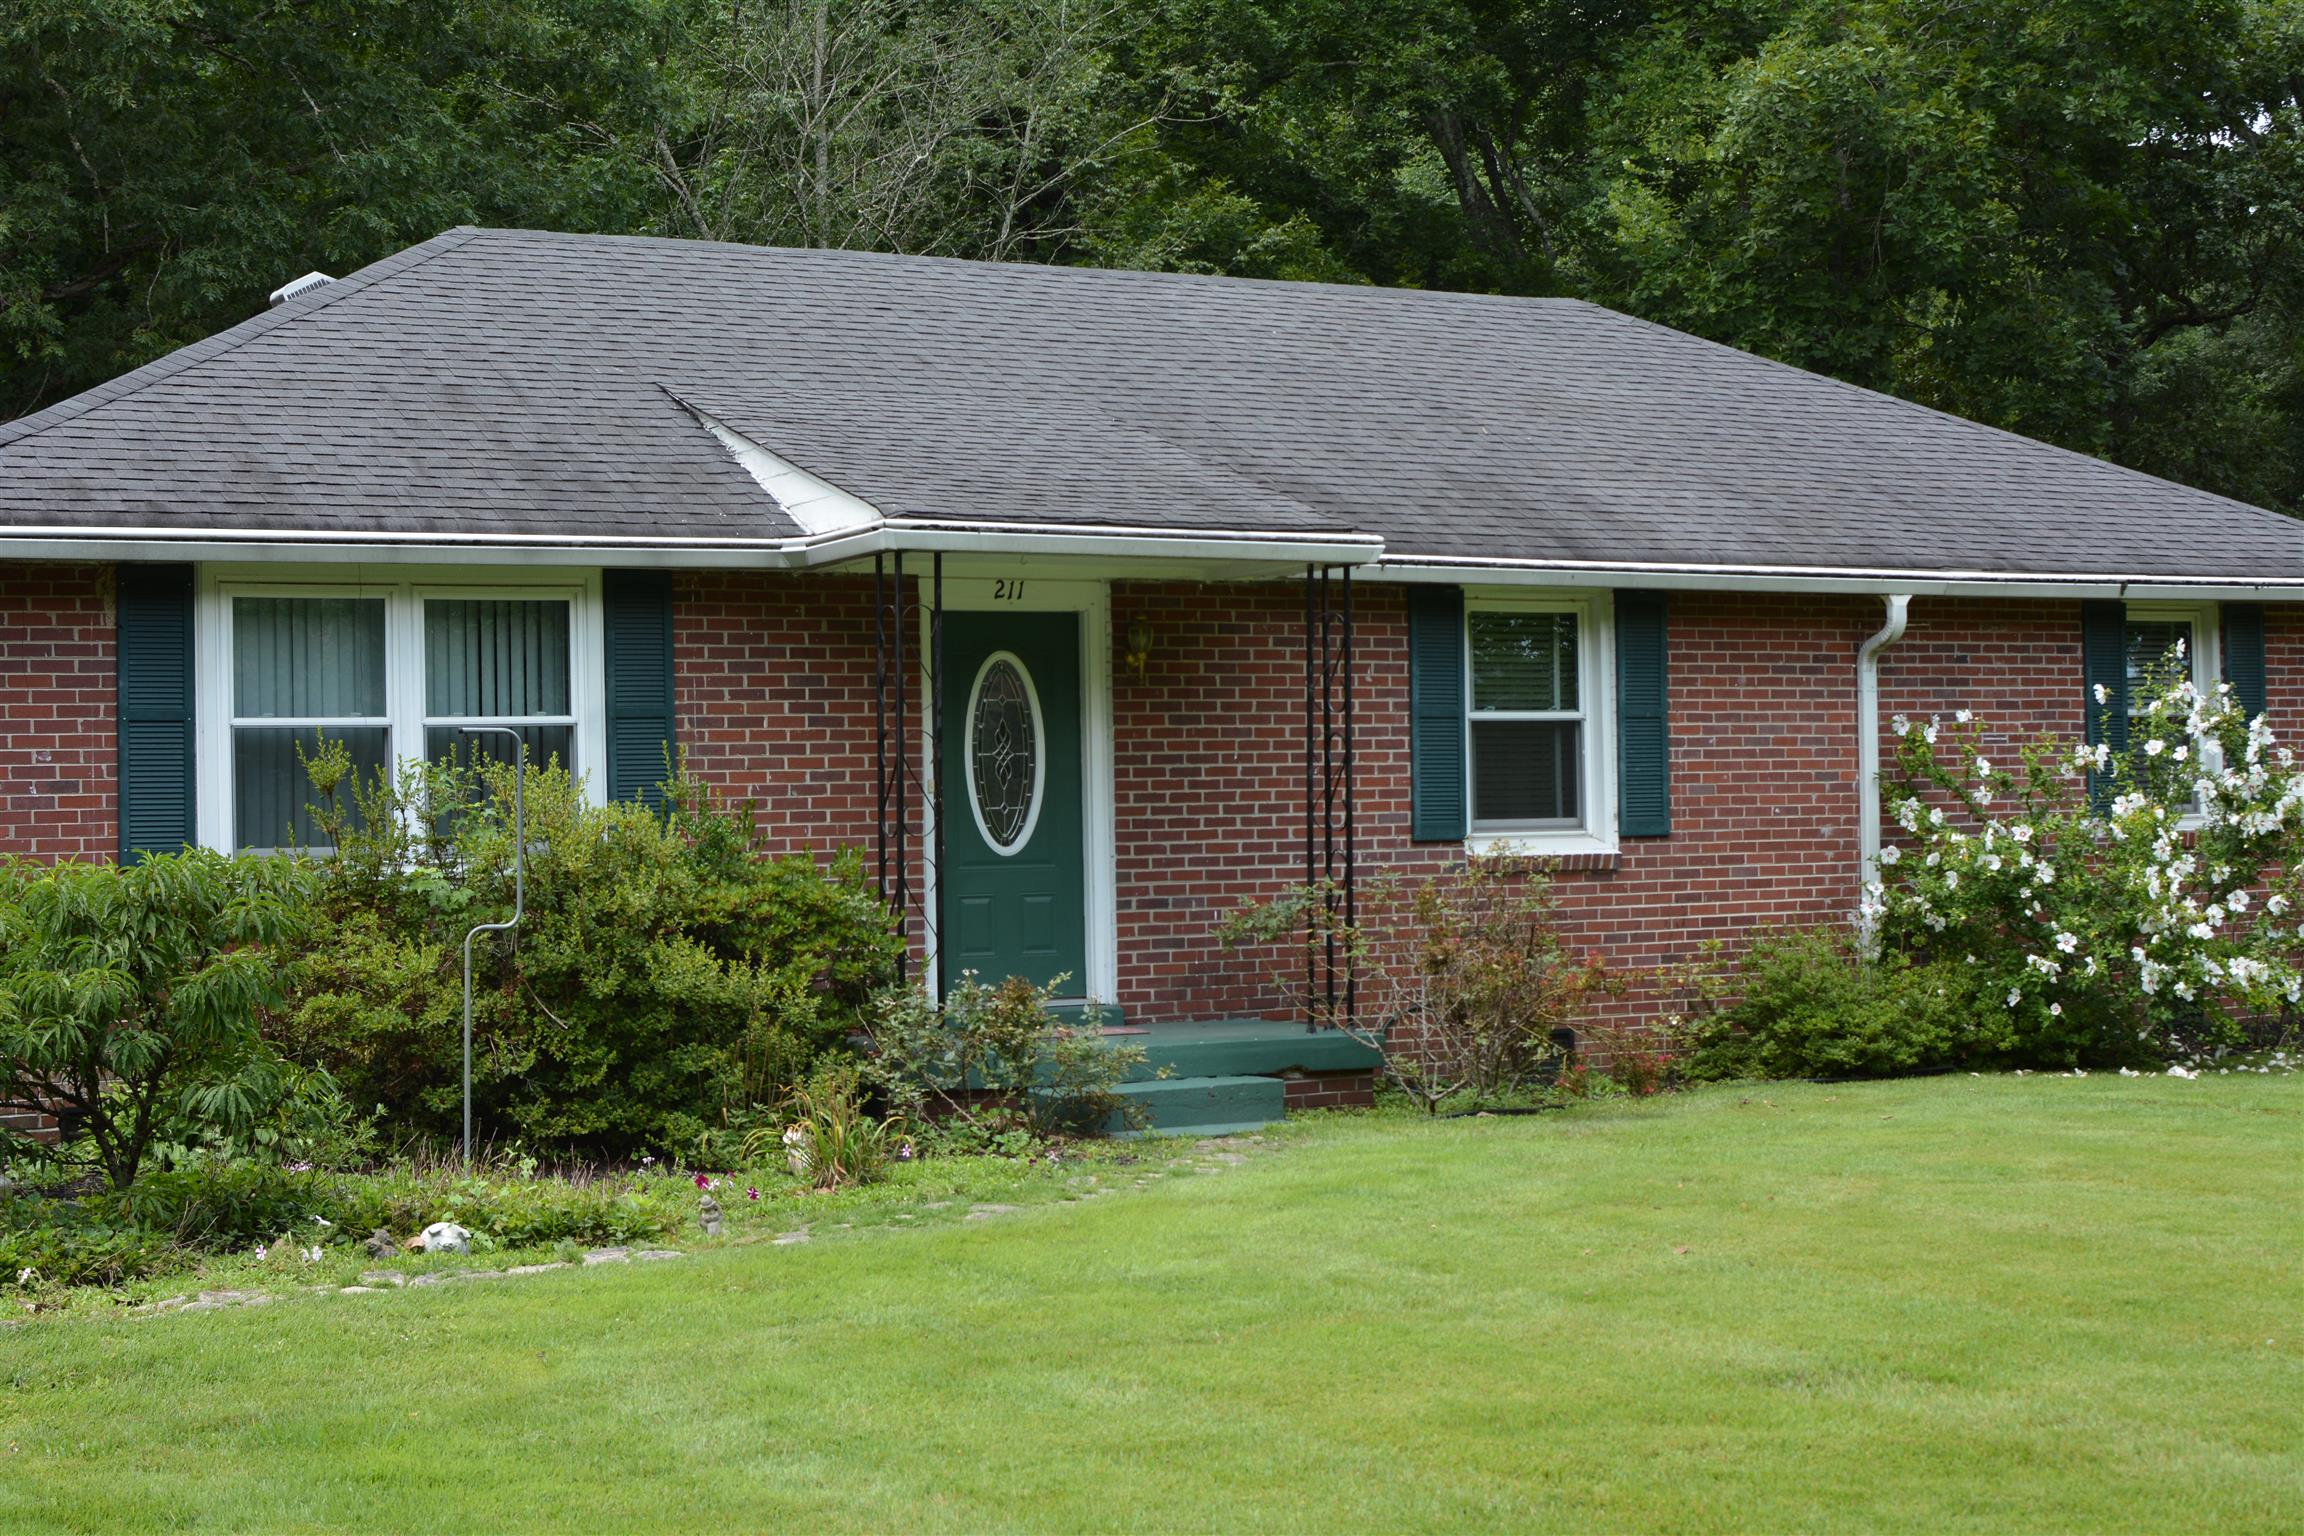 211 Jackson Cir, Tullahoma, TN 37388 - Tullahoma, TN real estate listing